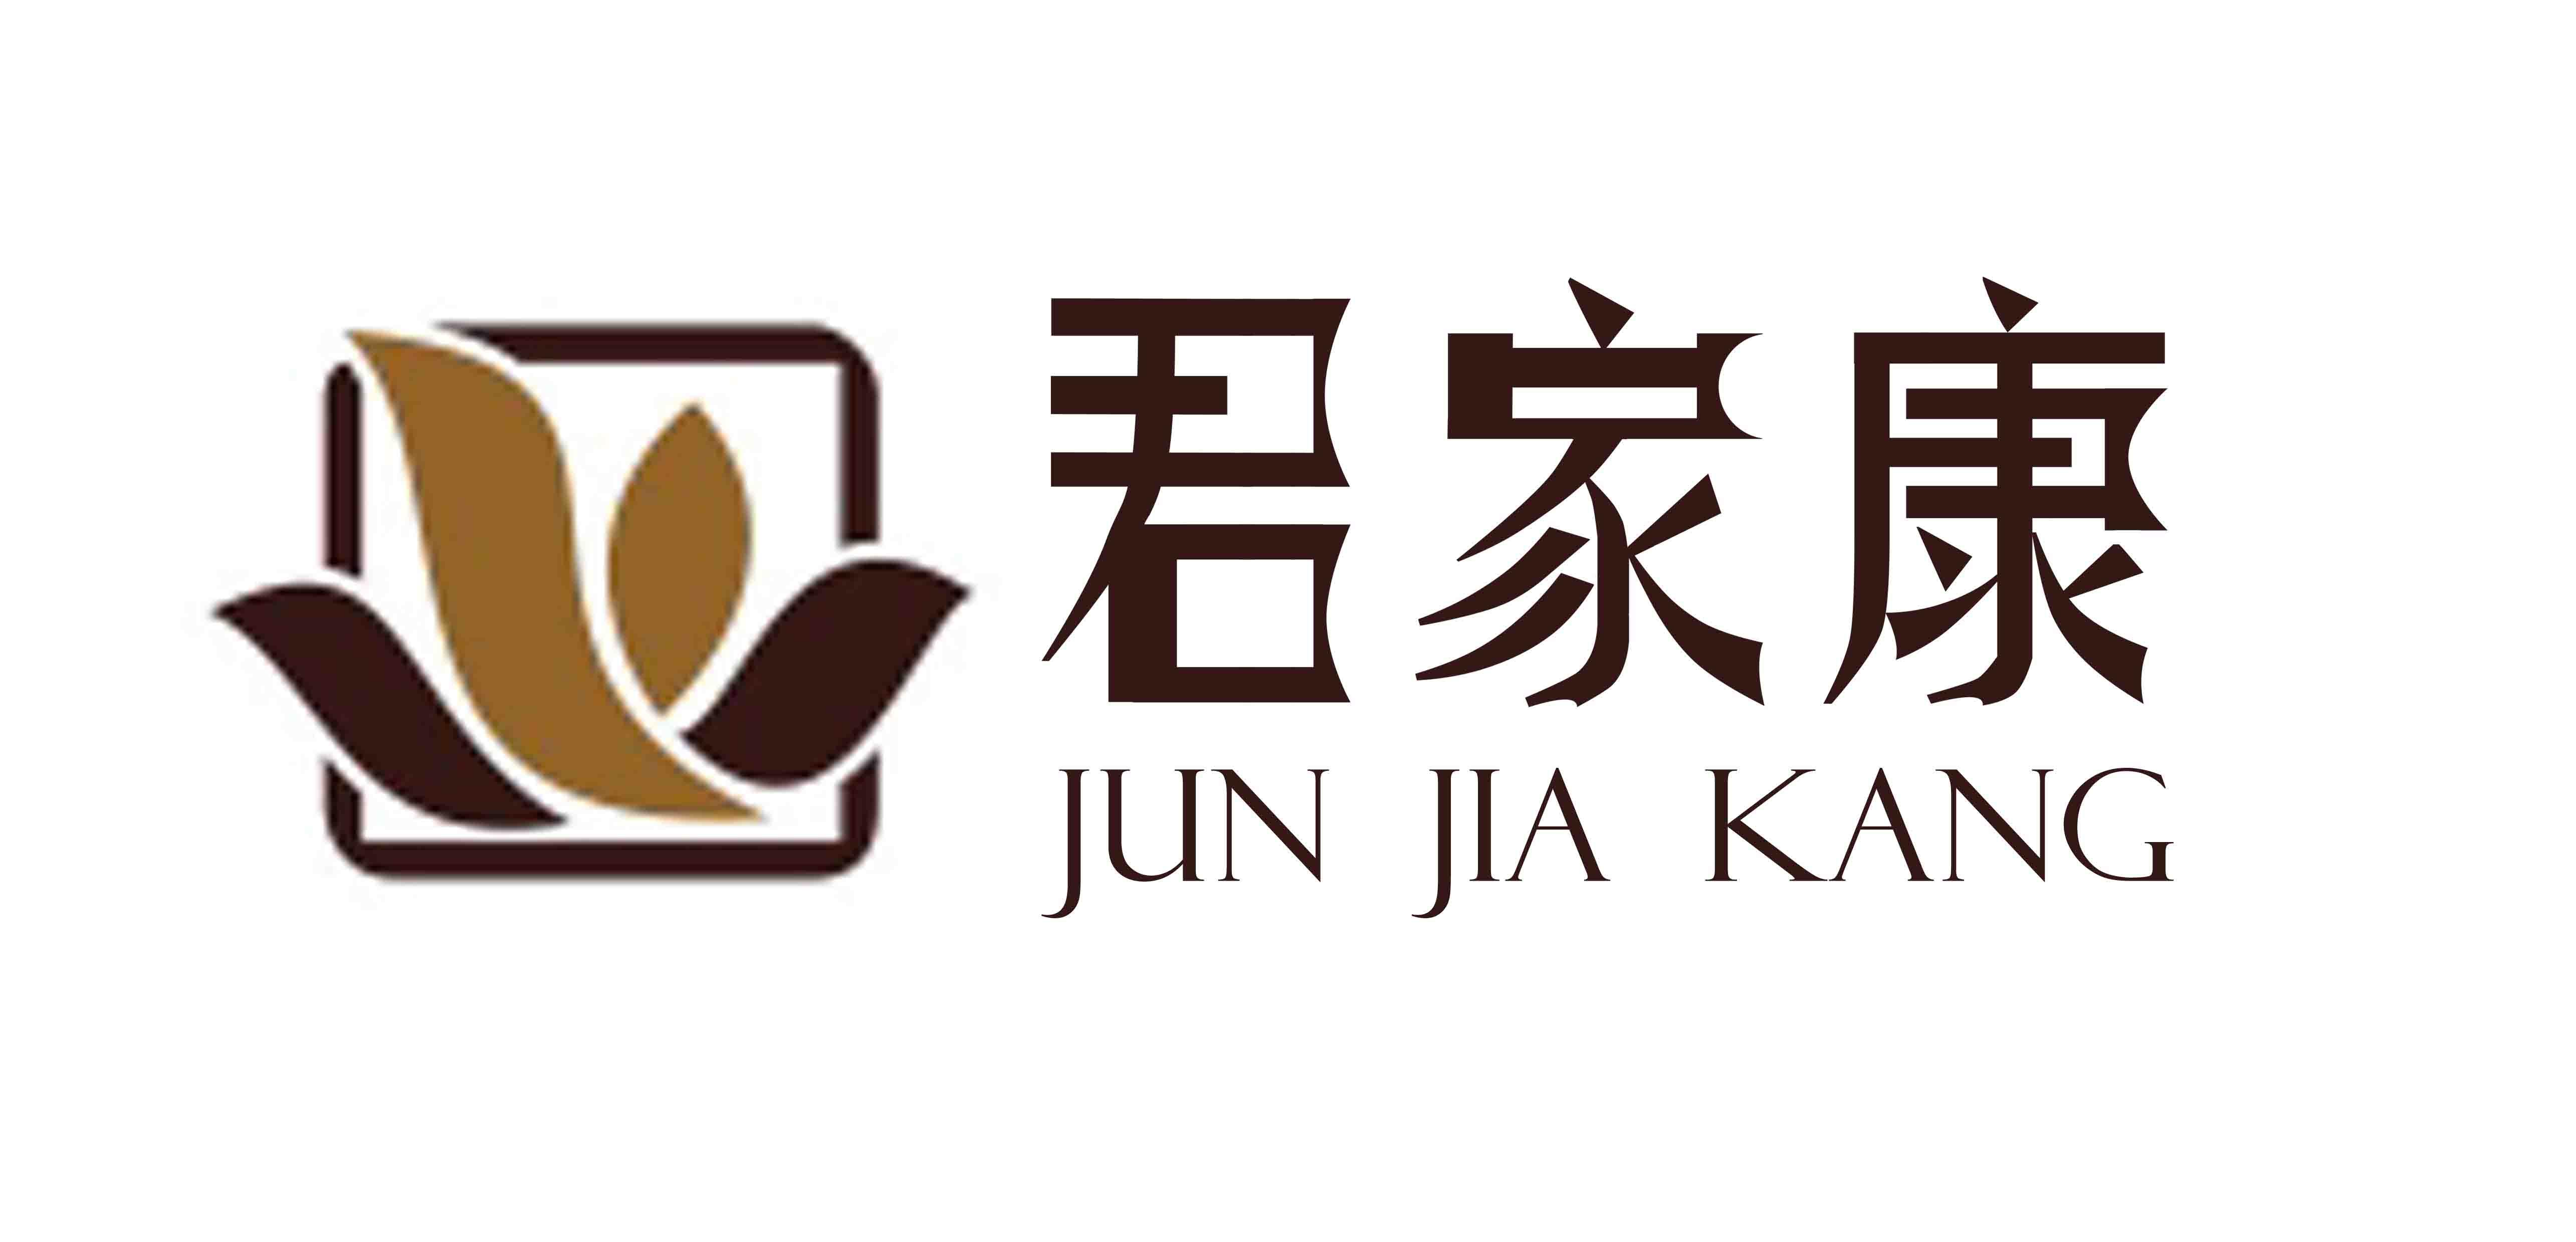 logo中的字体设计